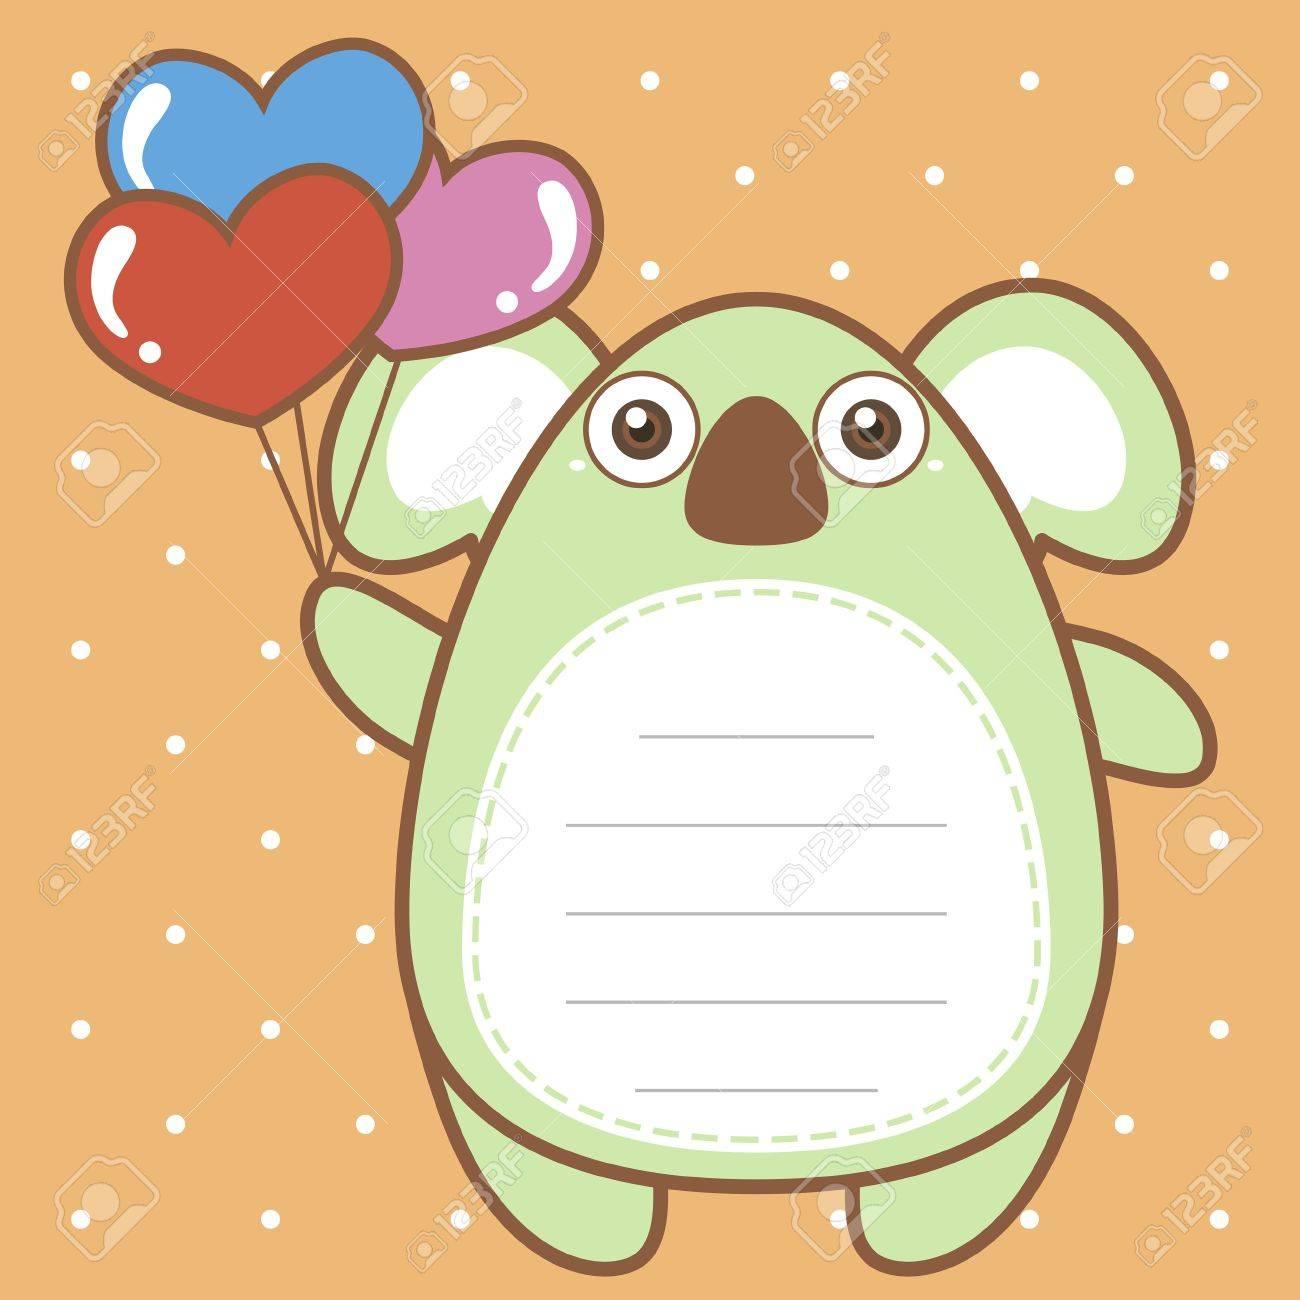 cute koala of scrapbook background. Stock Vector - 20589154